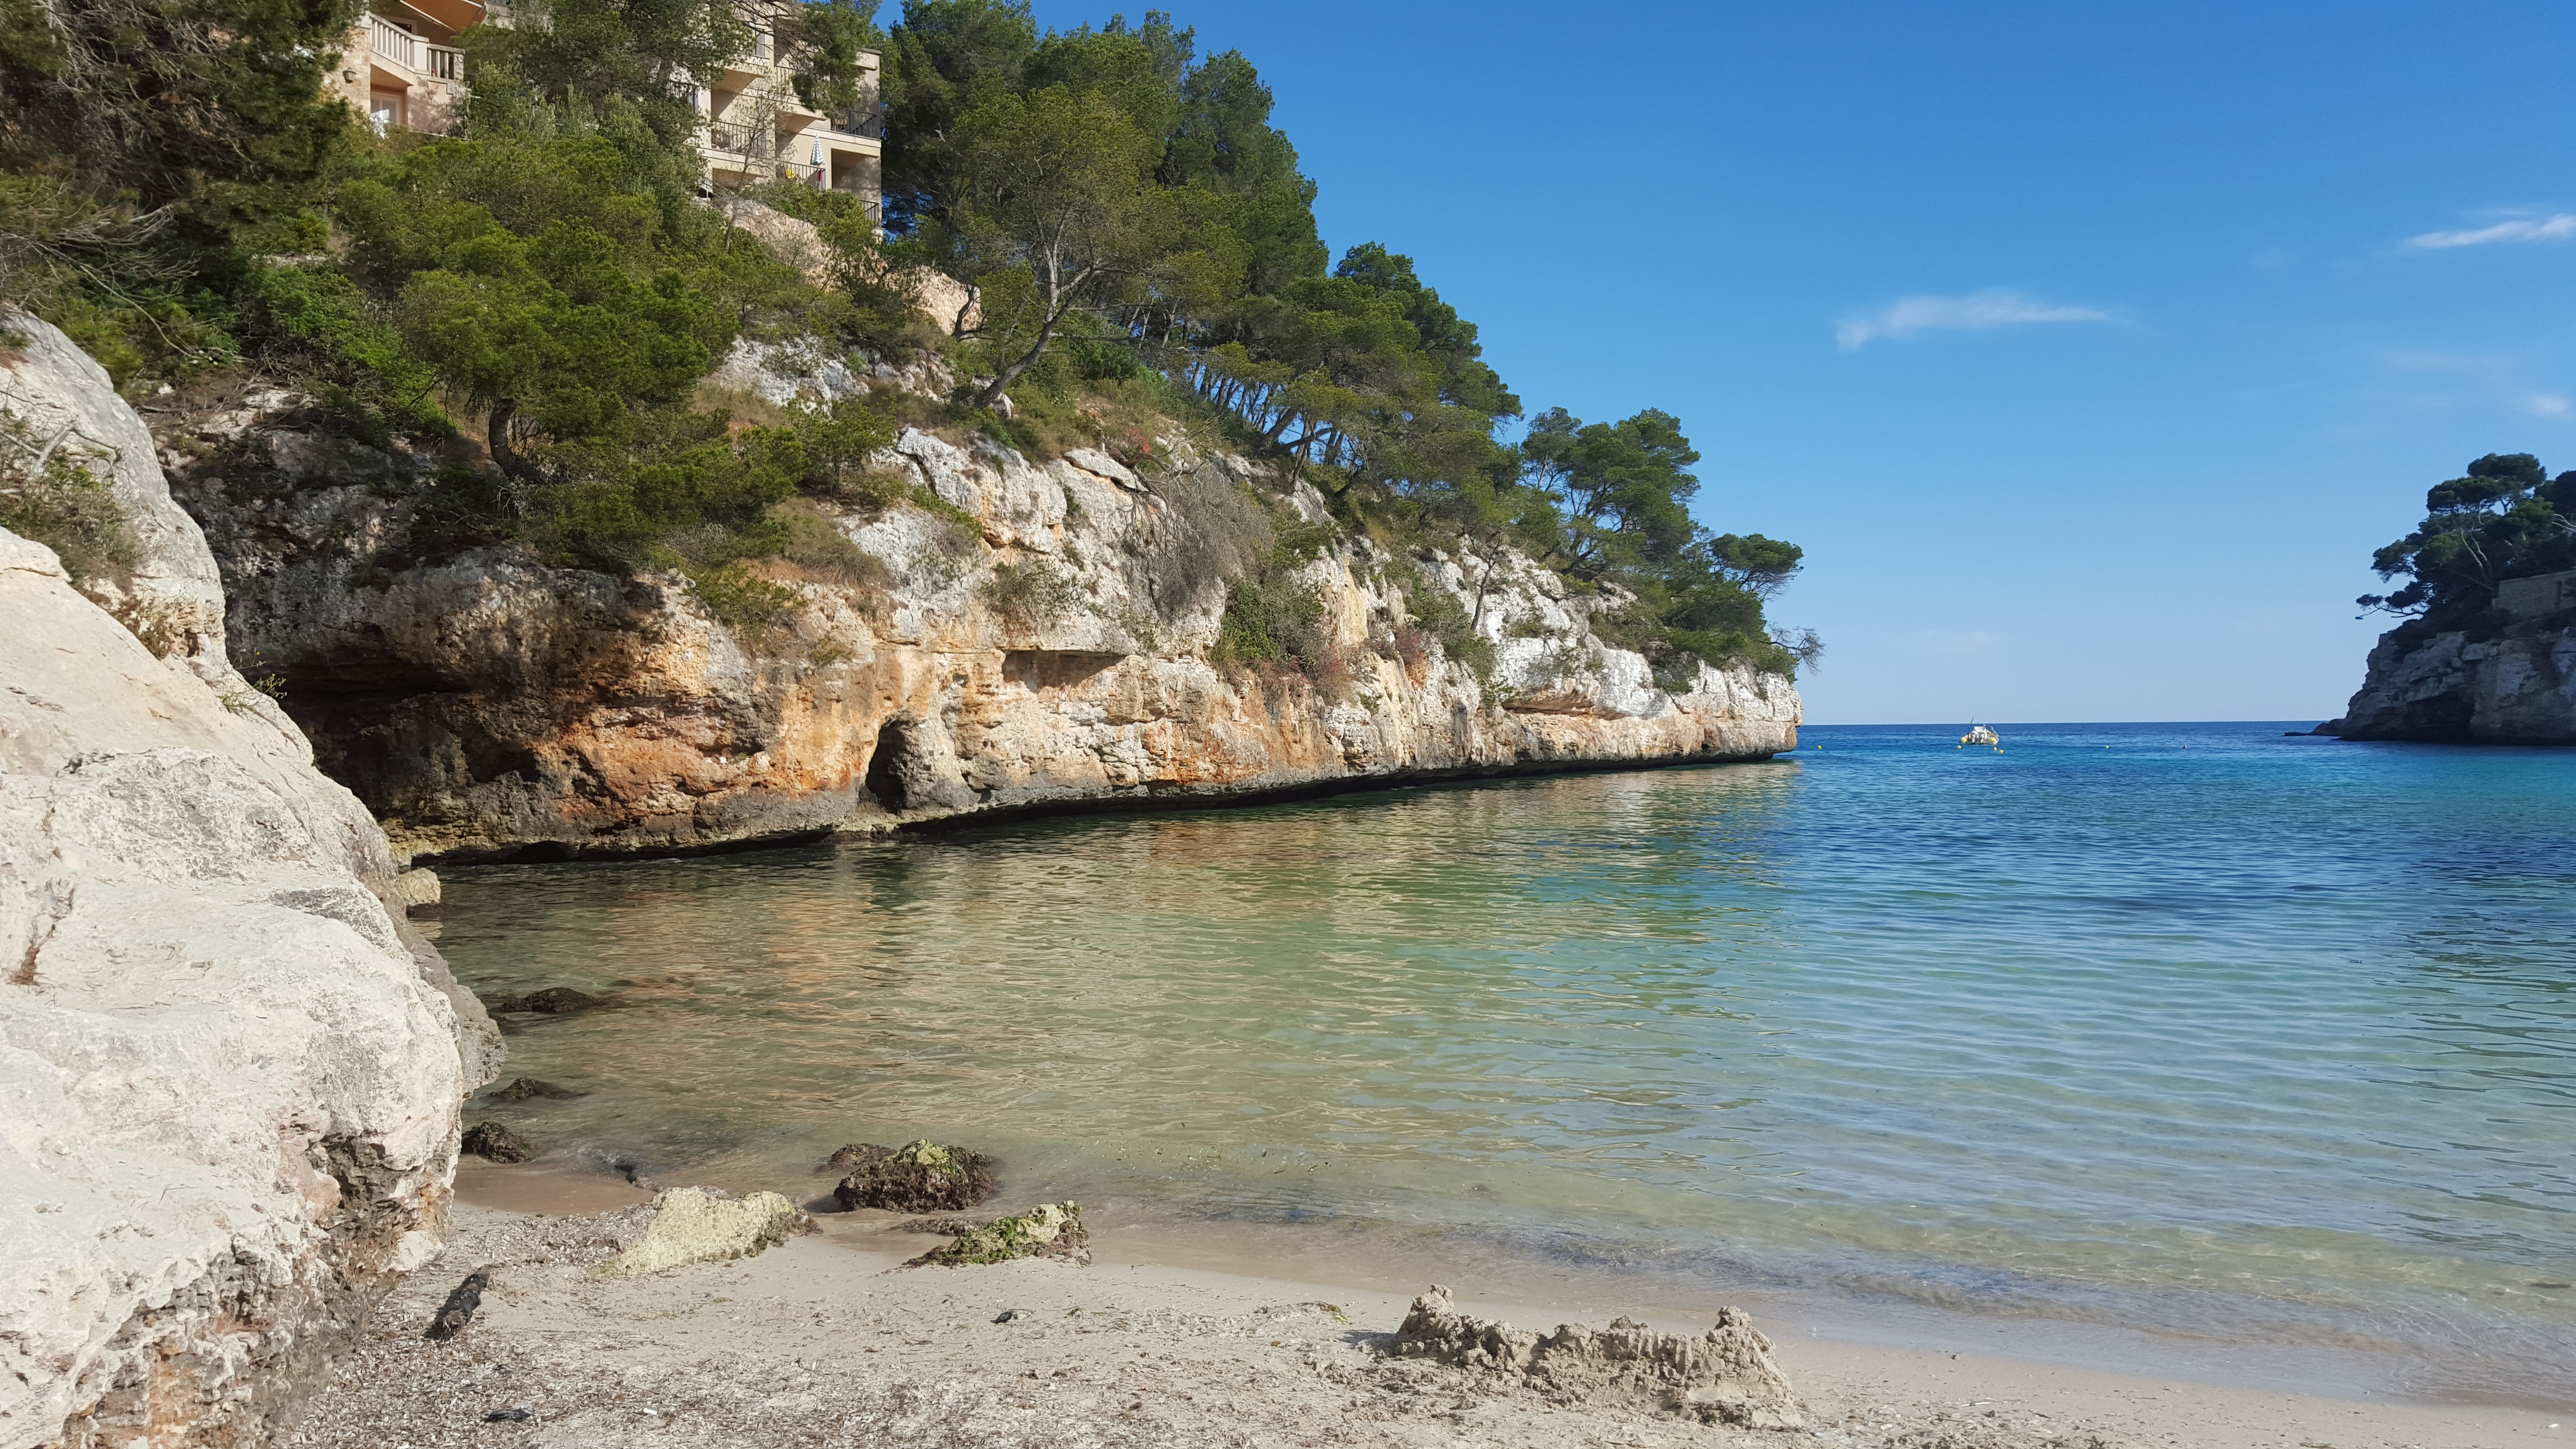 Bild: Yoga Verena Näpflin derraum Yogaferien Mallorca